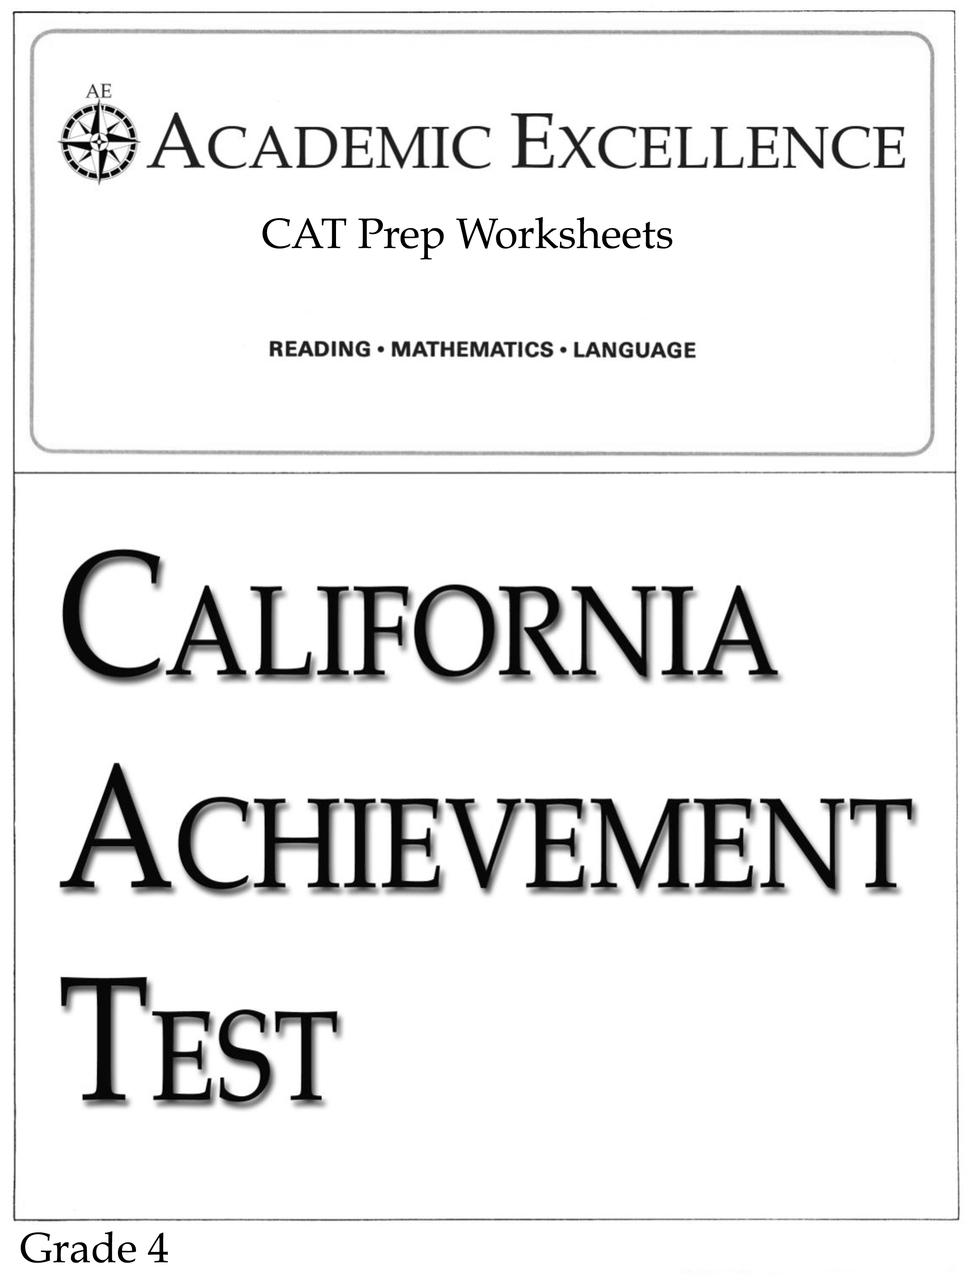 CAT Prep Pack: Grade 4 - PDF Download - Academic Excellence [ 1280 x 968 Pixel ]